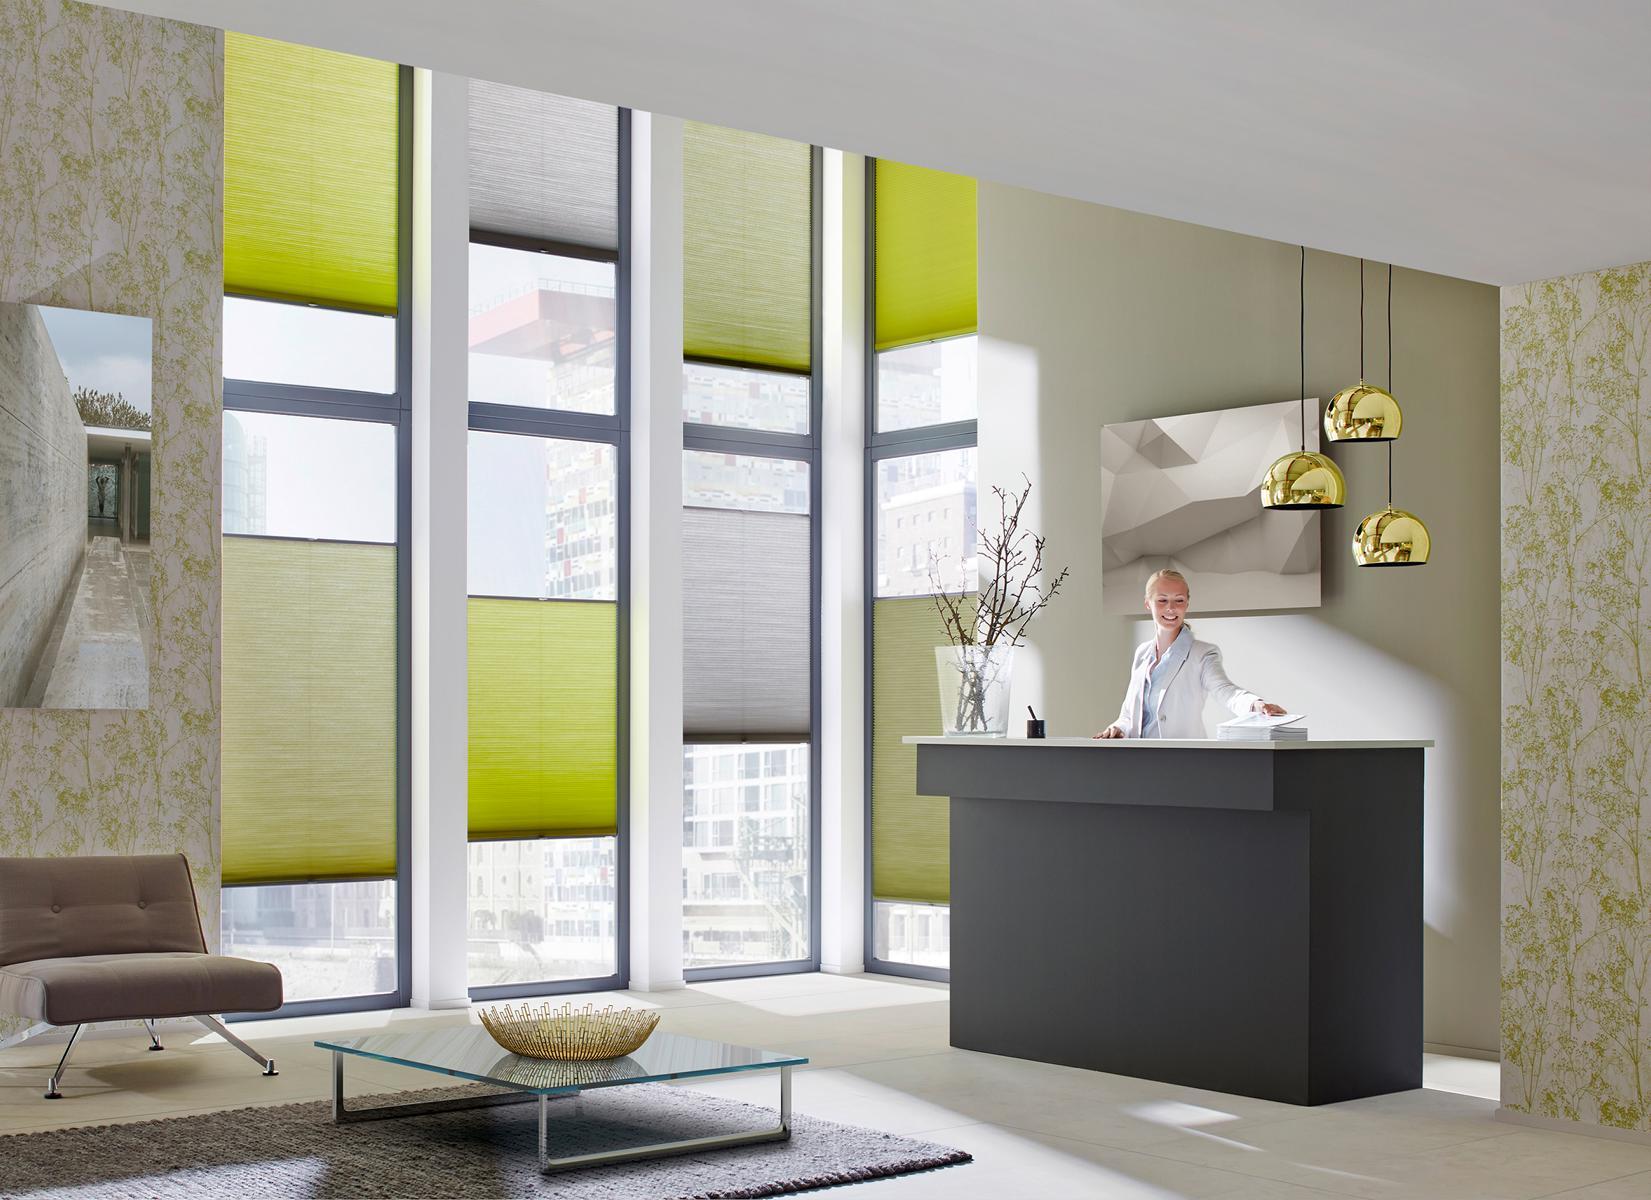 plissee angebot great efixs plissee auf ma tag breite bis cm x hhe bis cm montage klemmflex. Black Bedroom Furniture Sets. Home Design Ideas